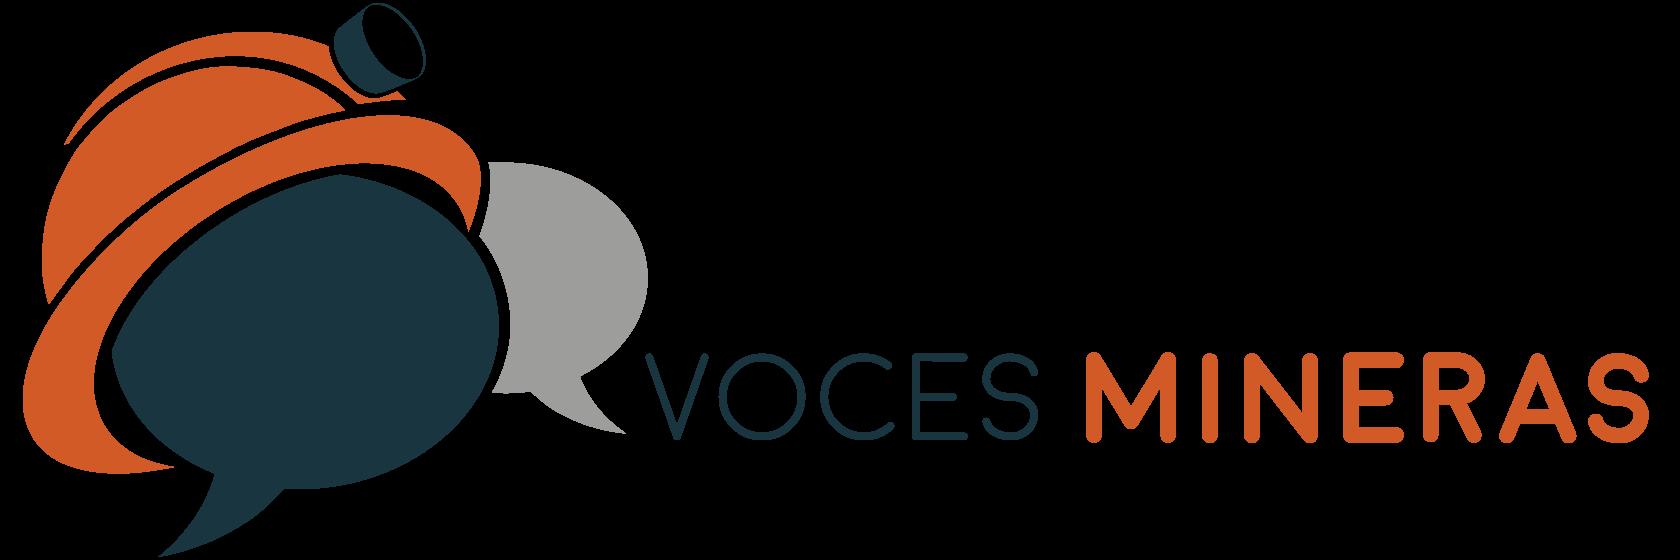 Voces Mineras